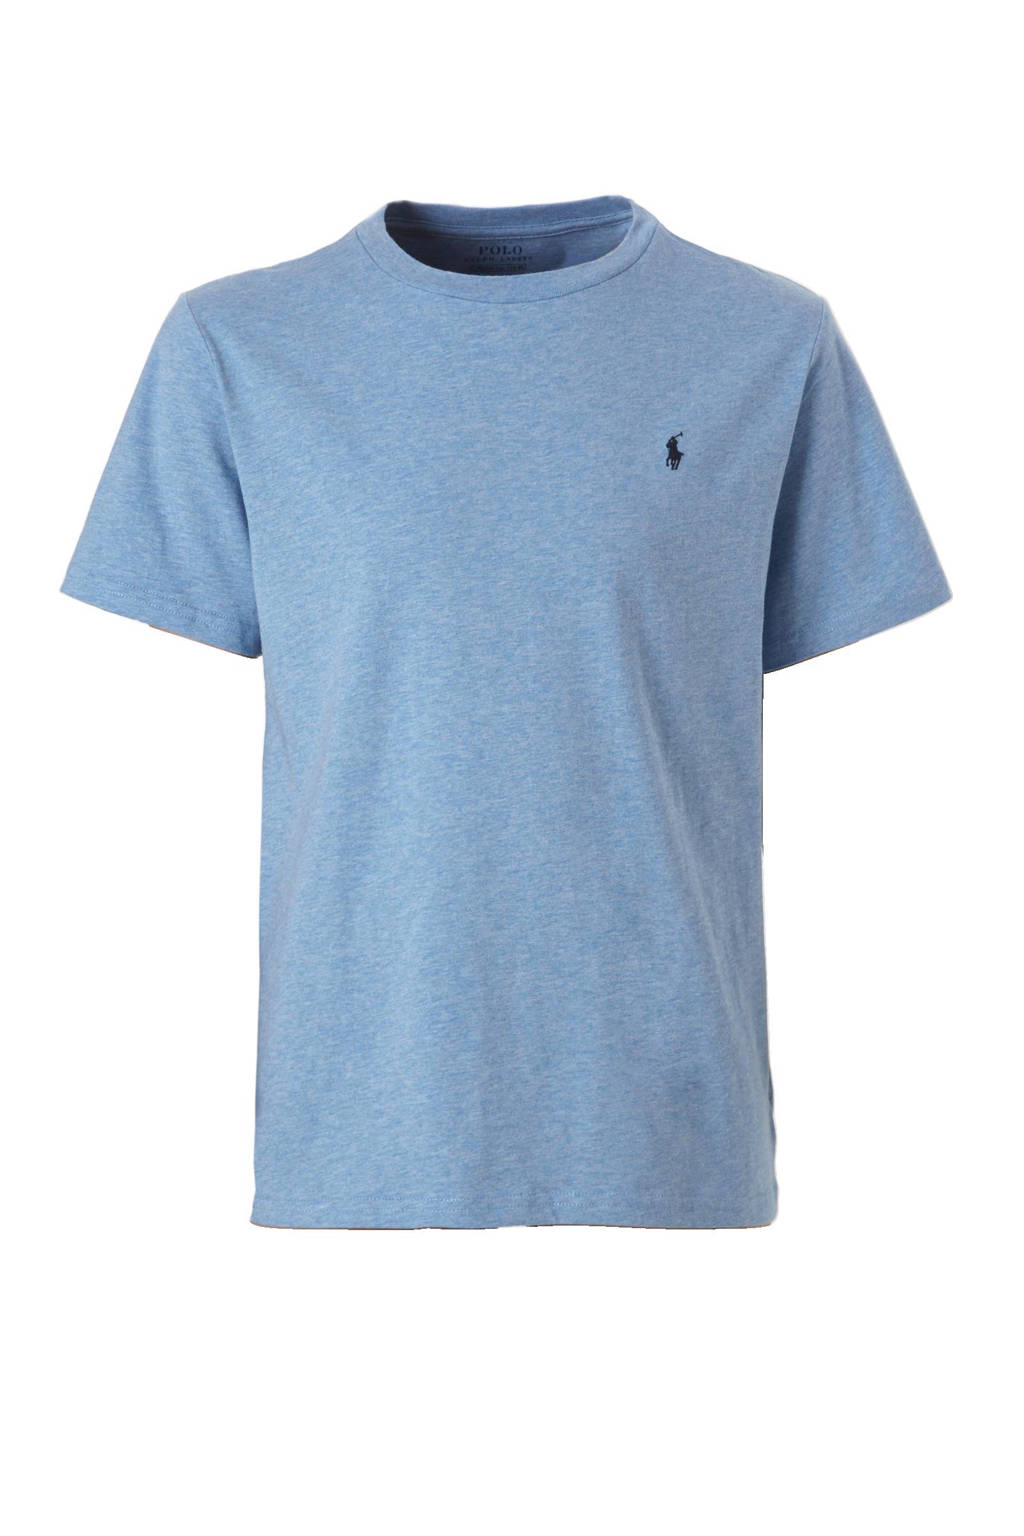 POLO Ralph Lauren T-shirt, Lichtblauw mêlee